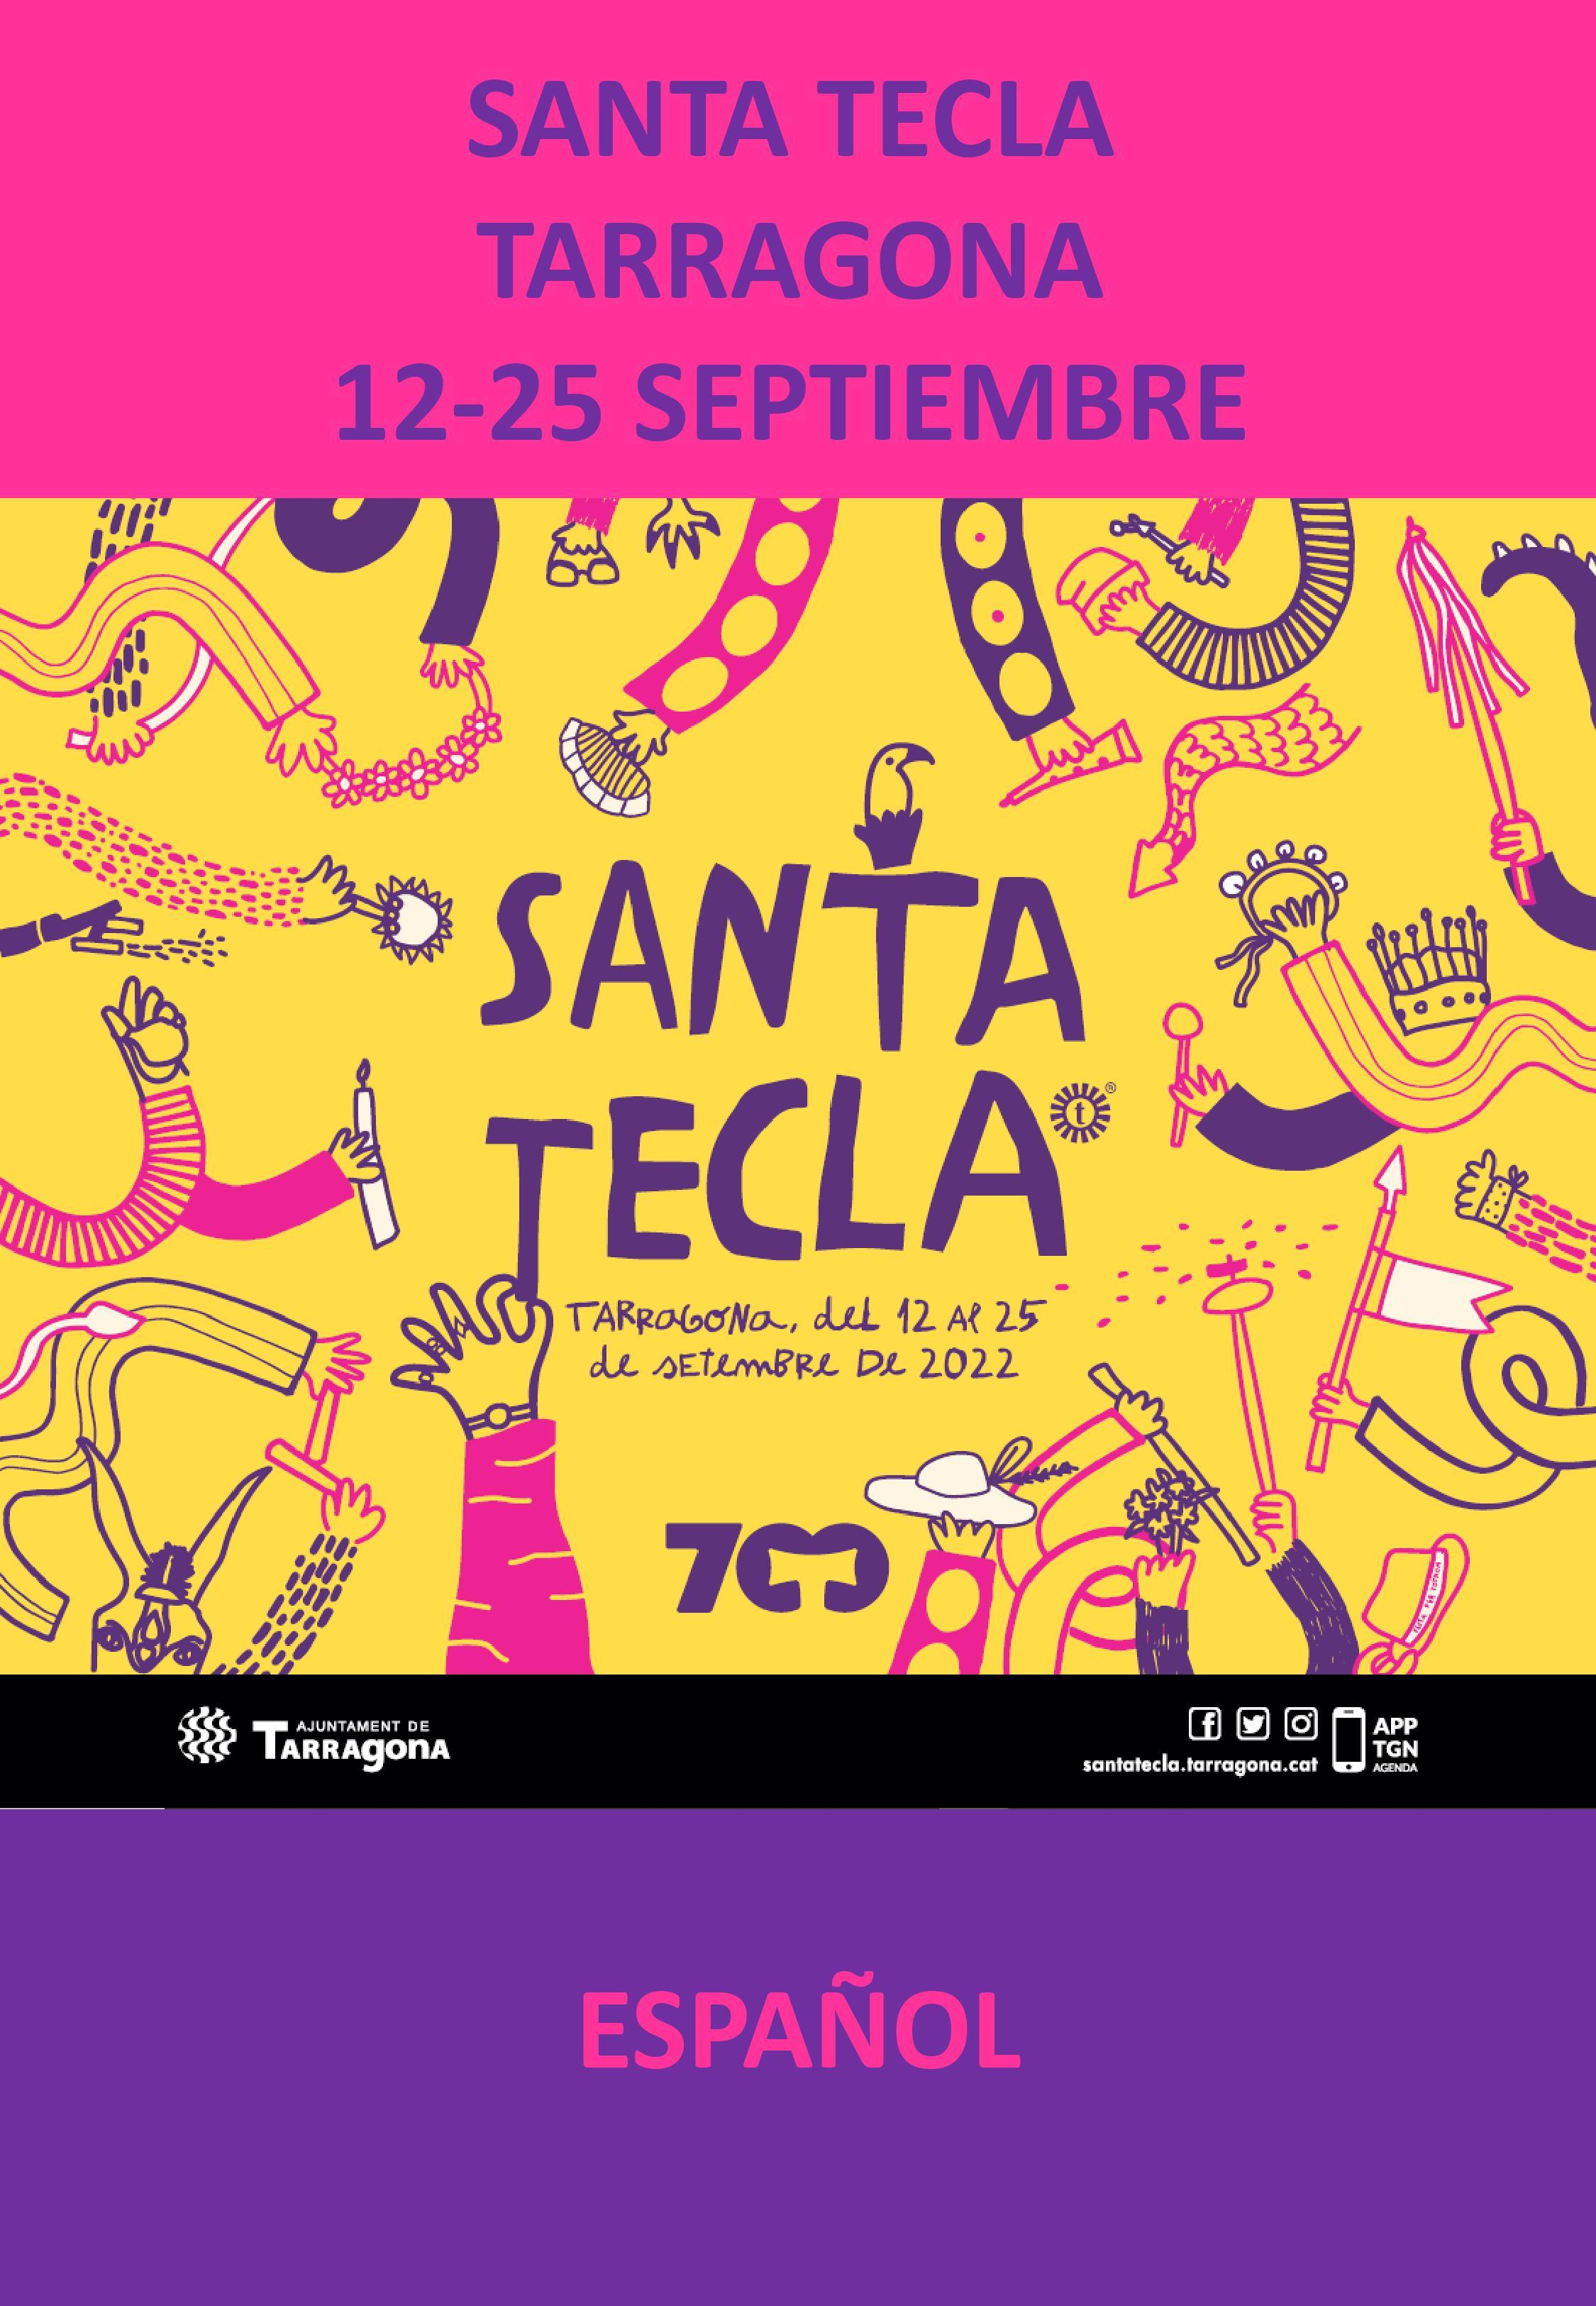 Programa de las Fiestas de Santa Tecla en Tarragona